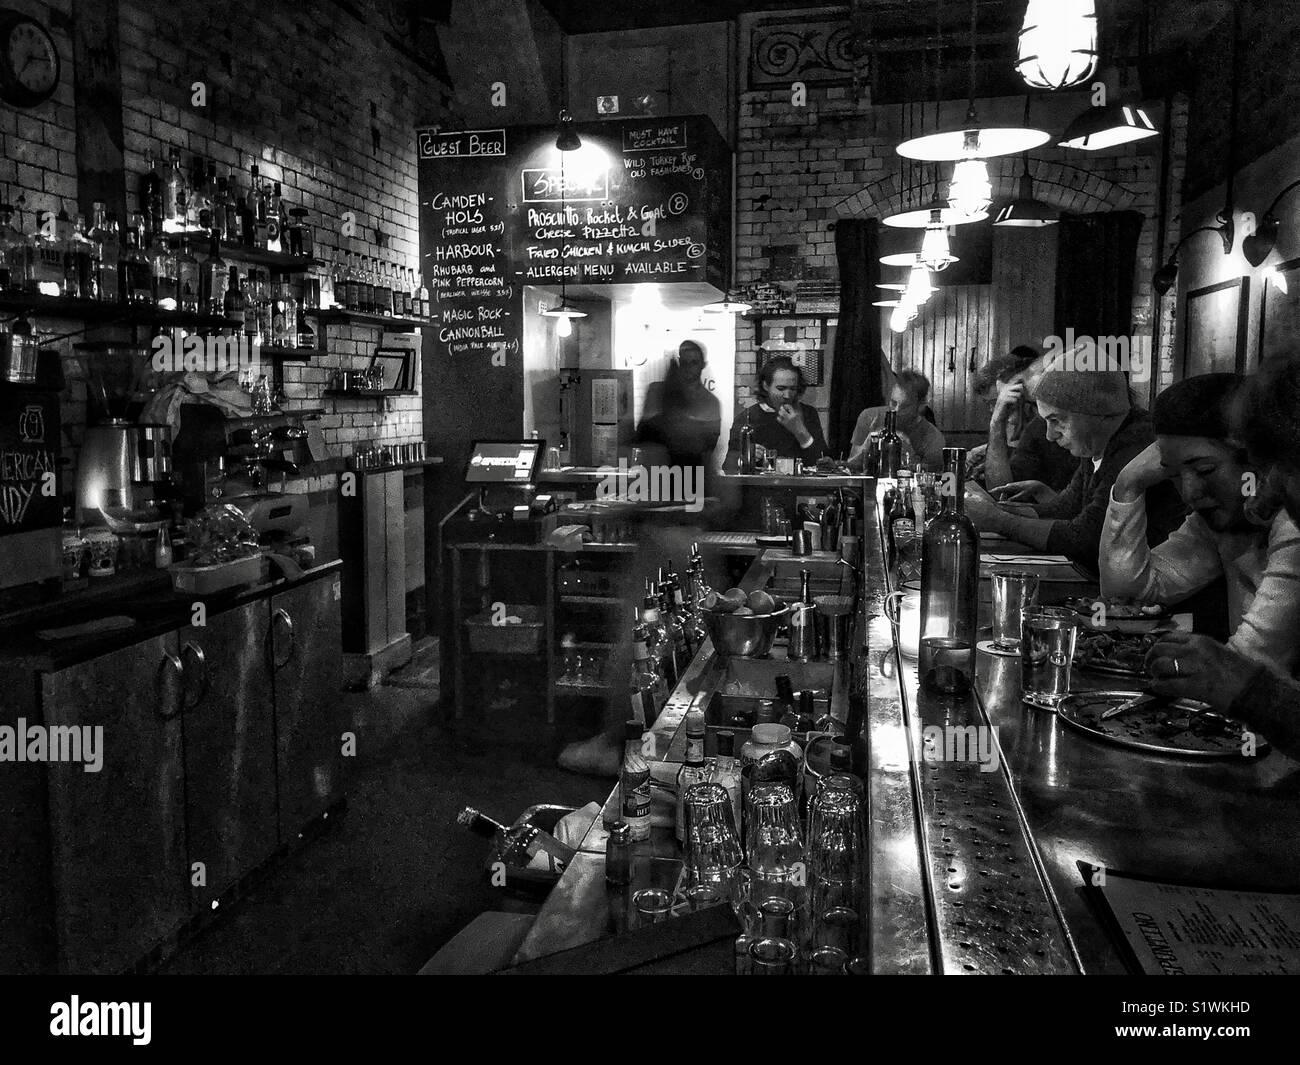 Diners at Spuntino bar and restaurant, London. - Stock Image